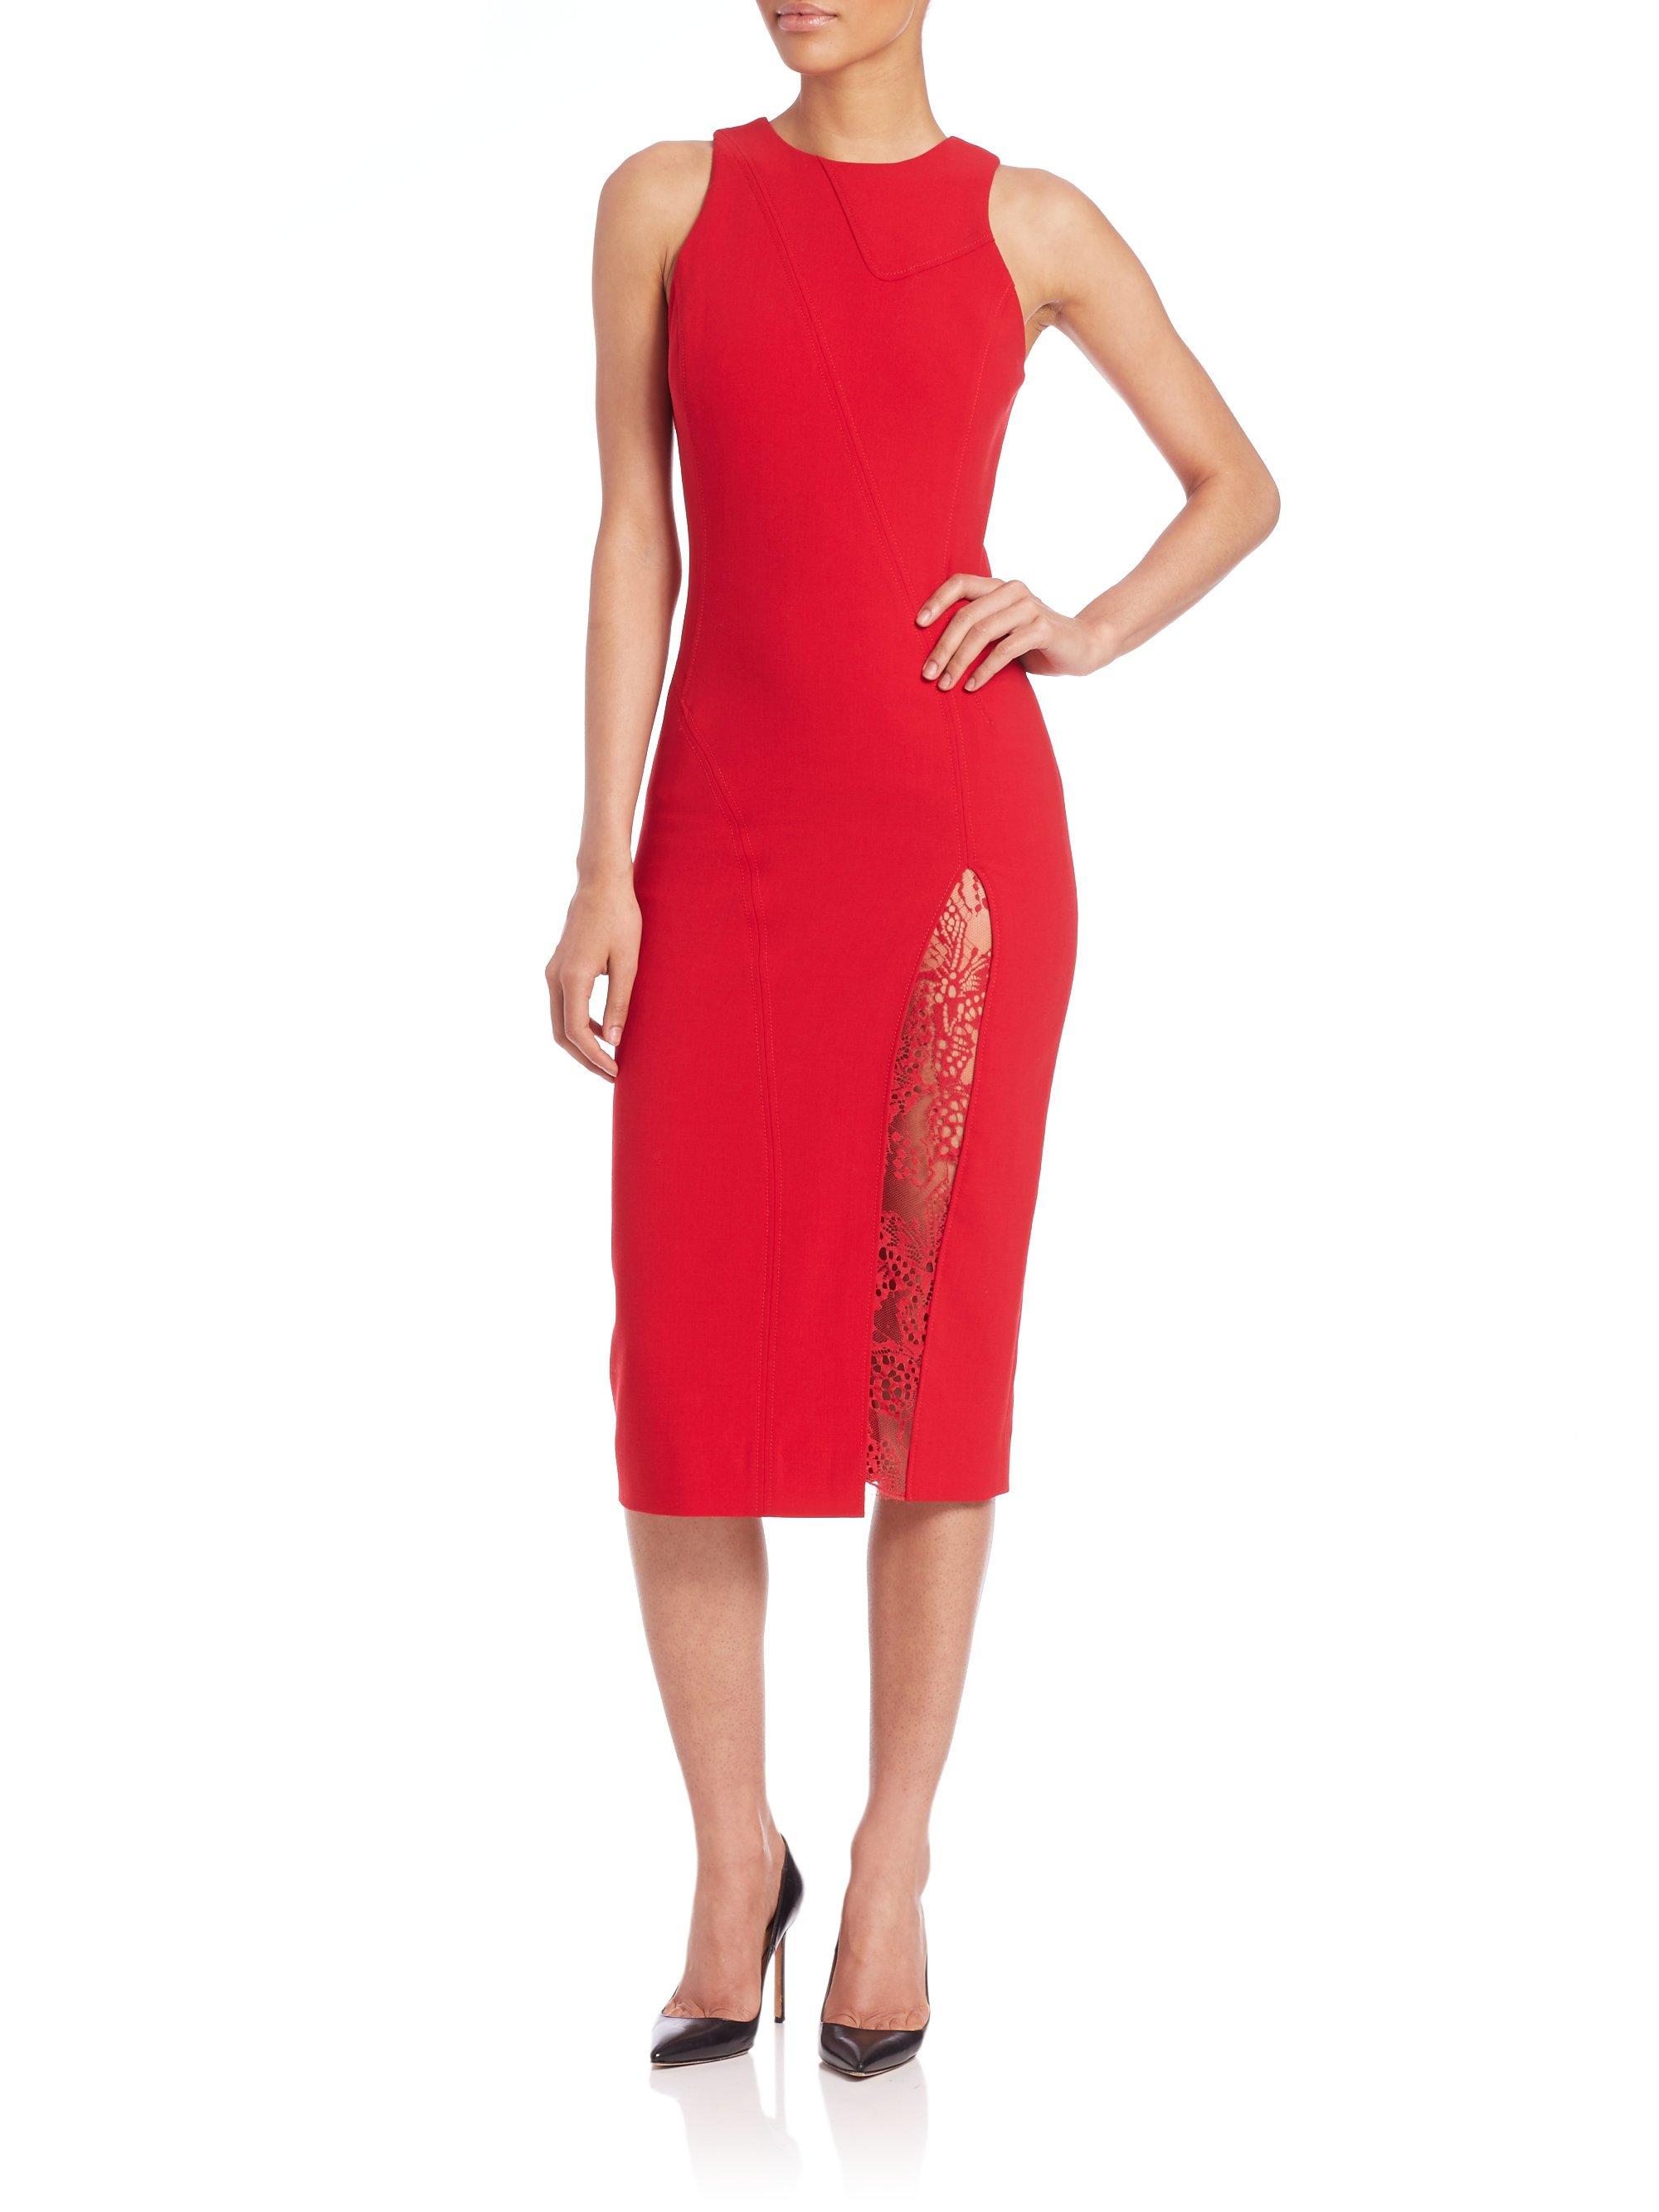 DRESSES - 3/4 length dresses Tamara Mellon 4DwIZCh